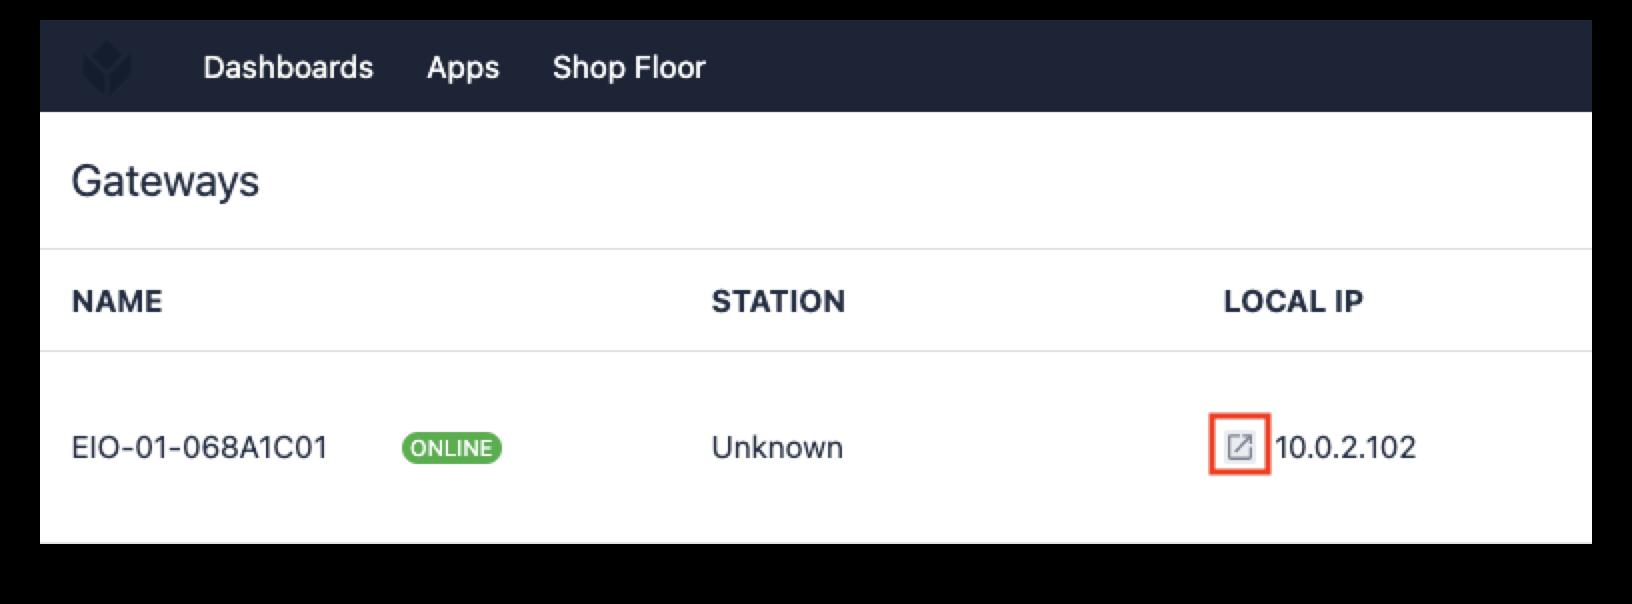 Tulip Shop Floor Portal for Gateway